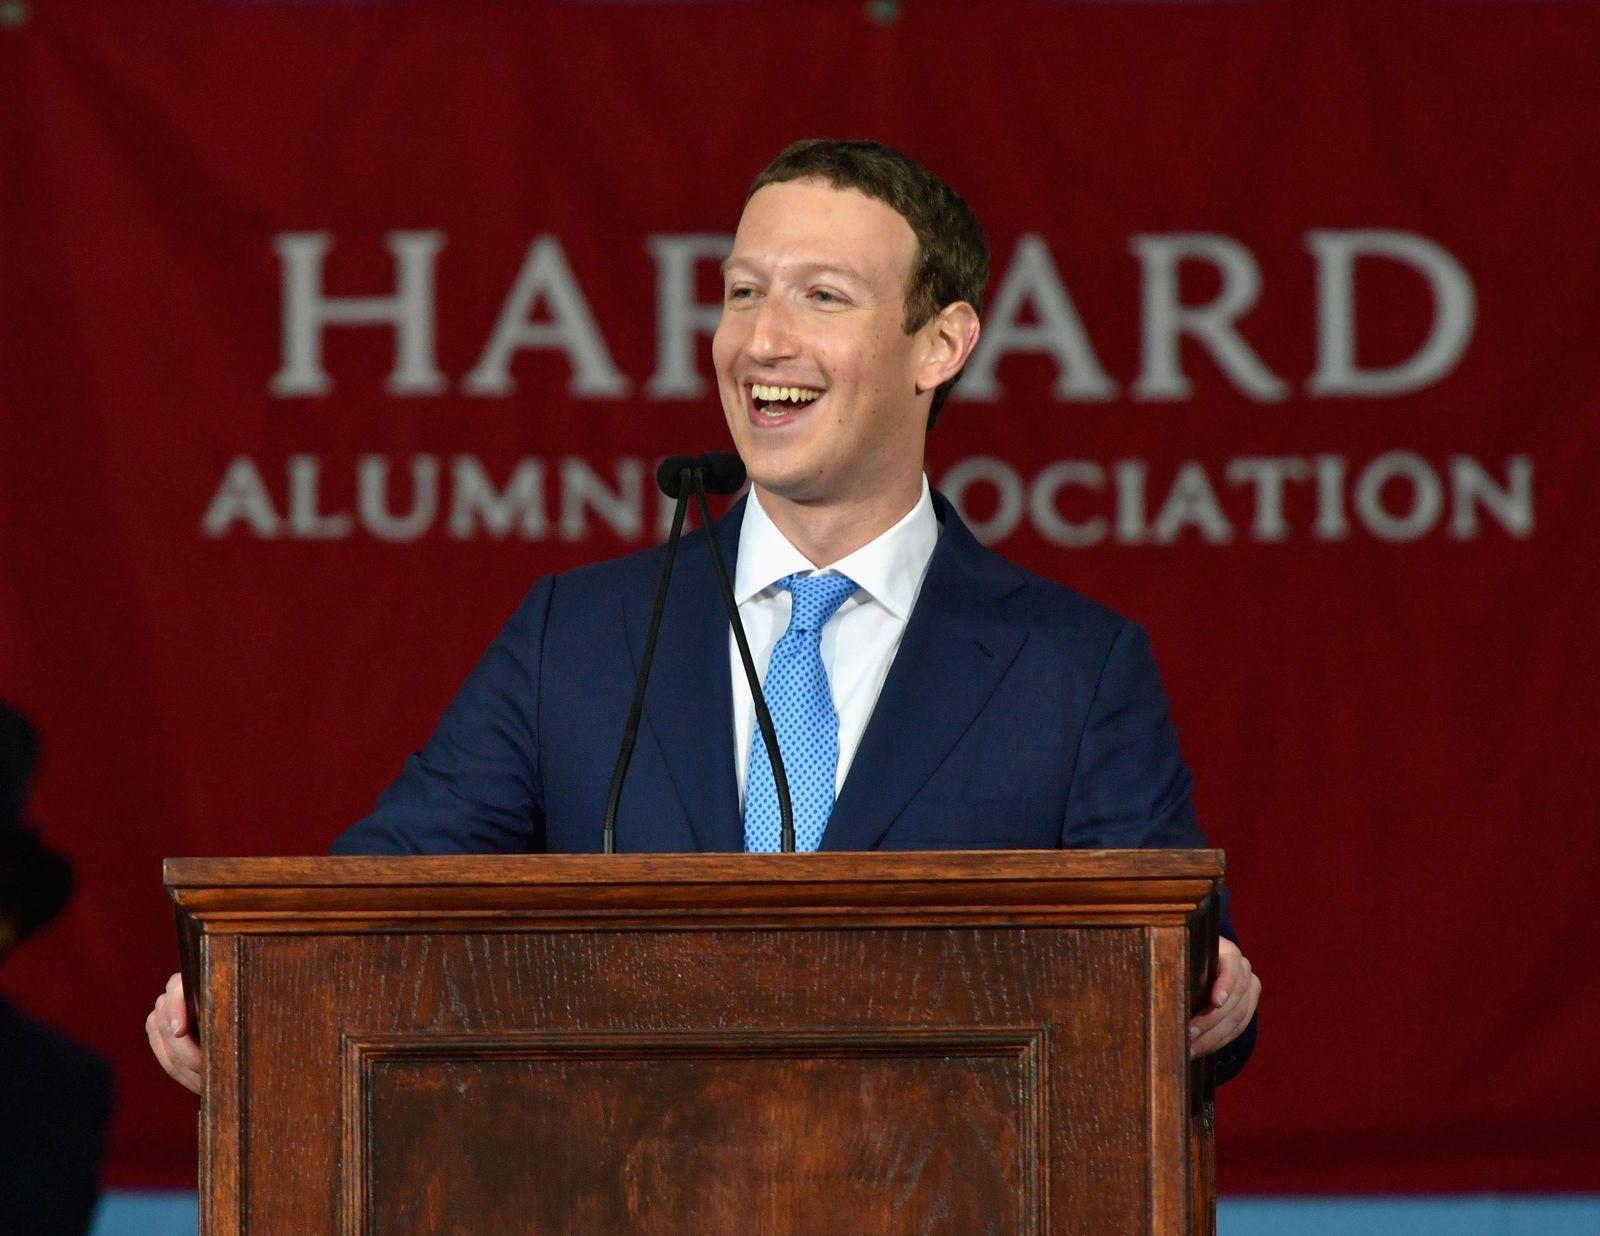 Zuckerberg/ Harvard